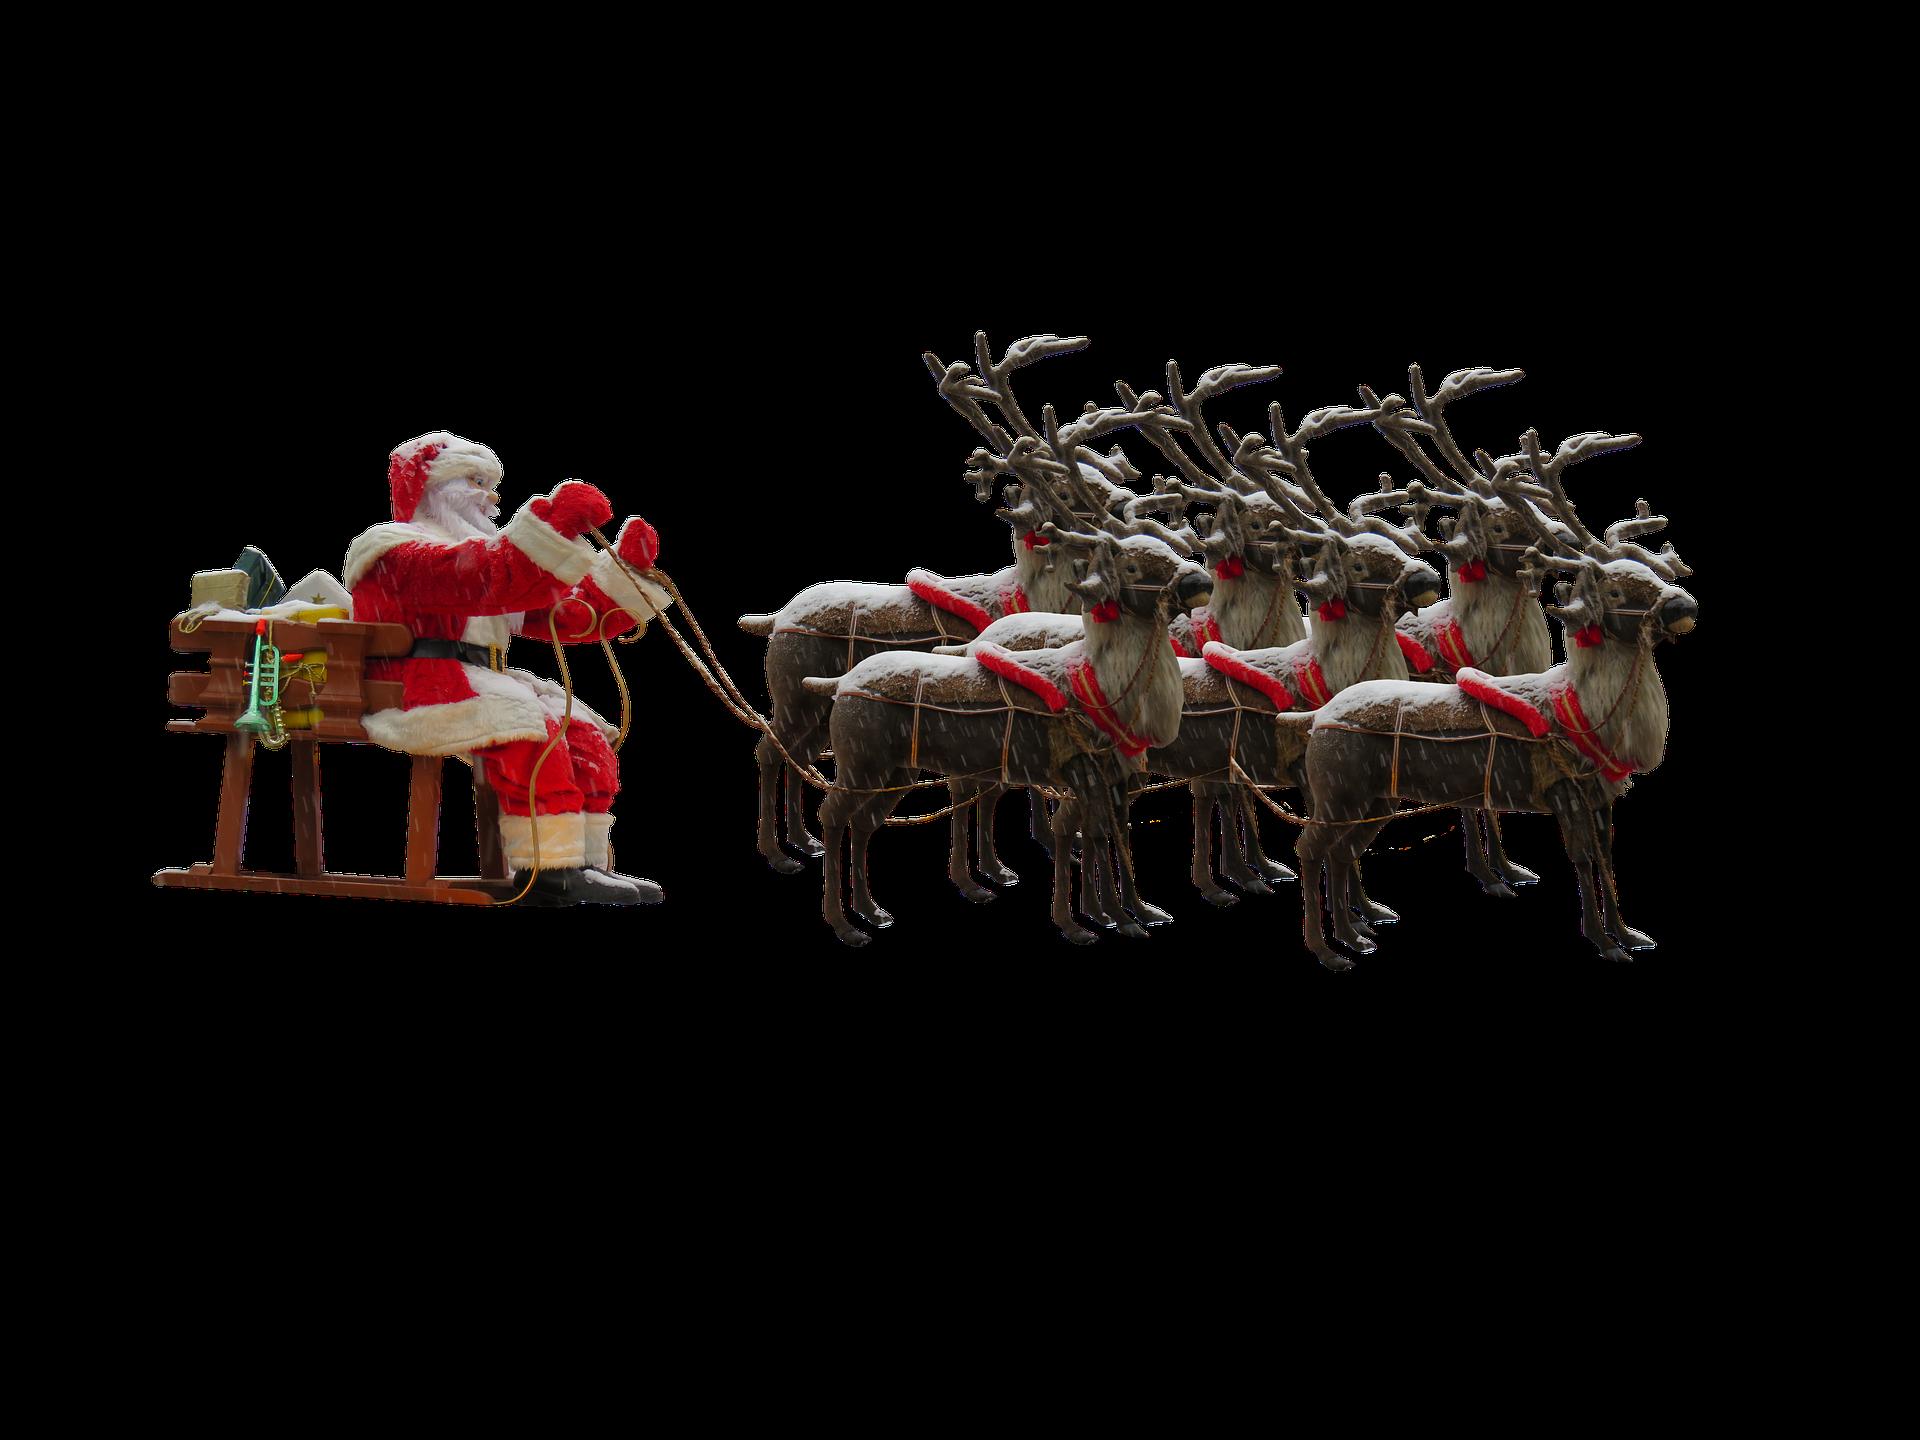 Santa's Ride, Christmas, Claus, Fig, Figure, HQ Photo